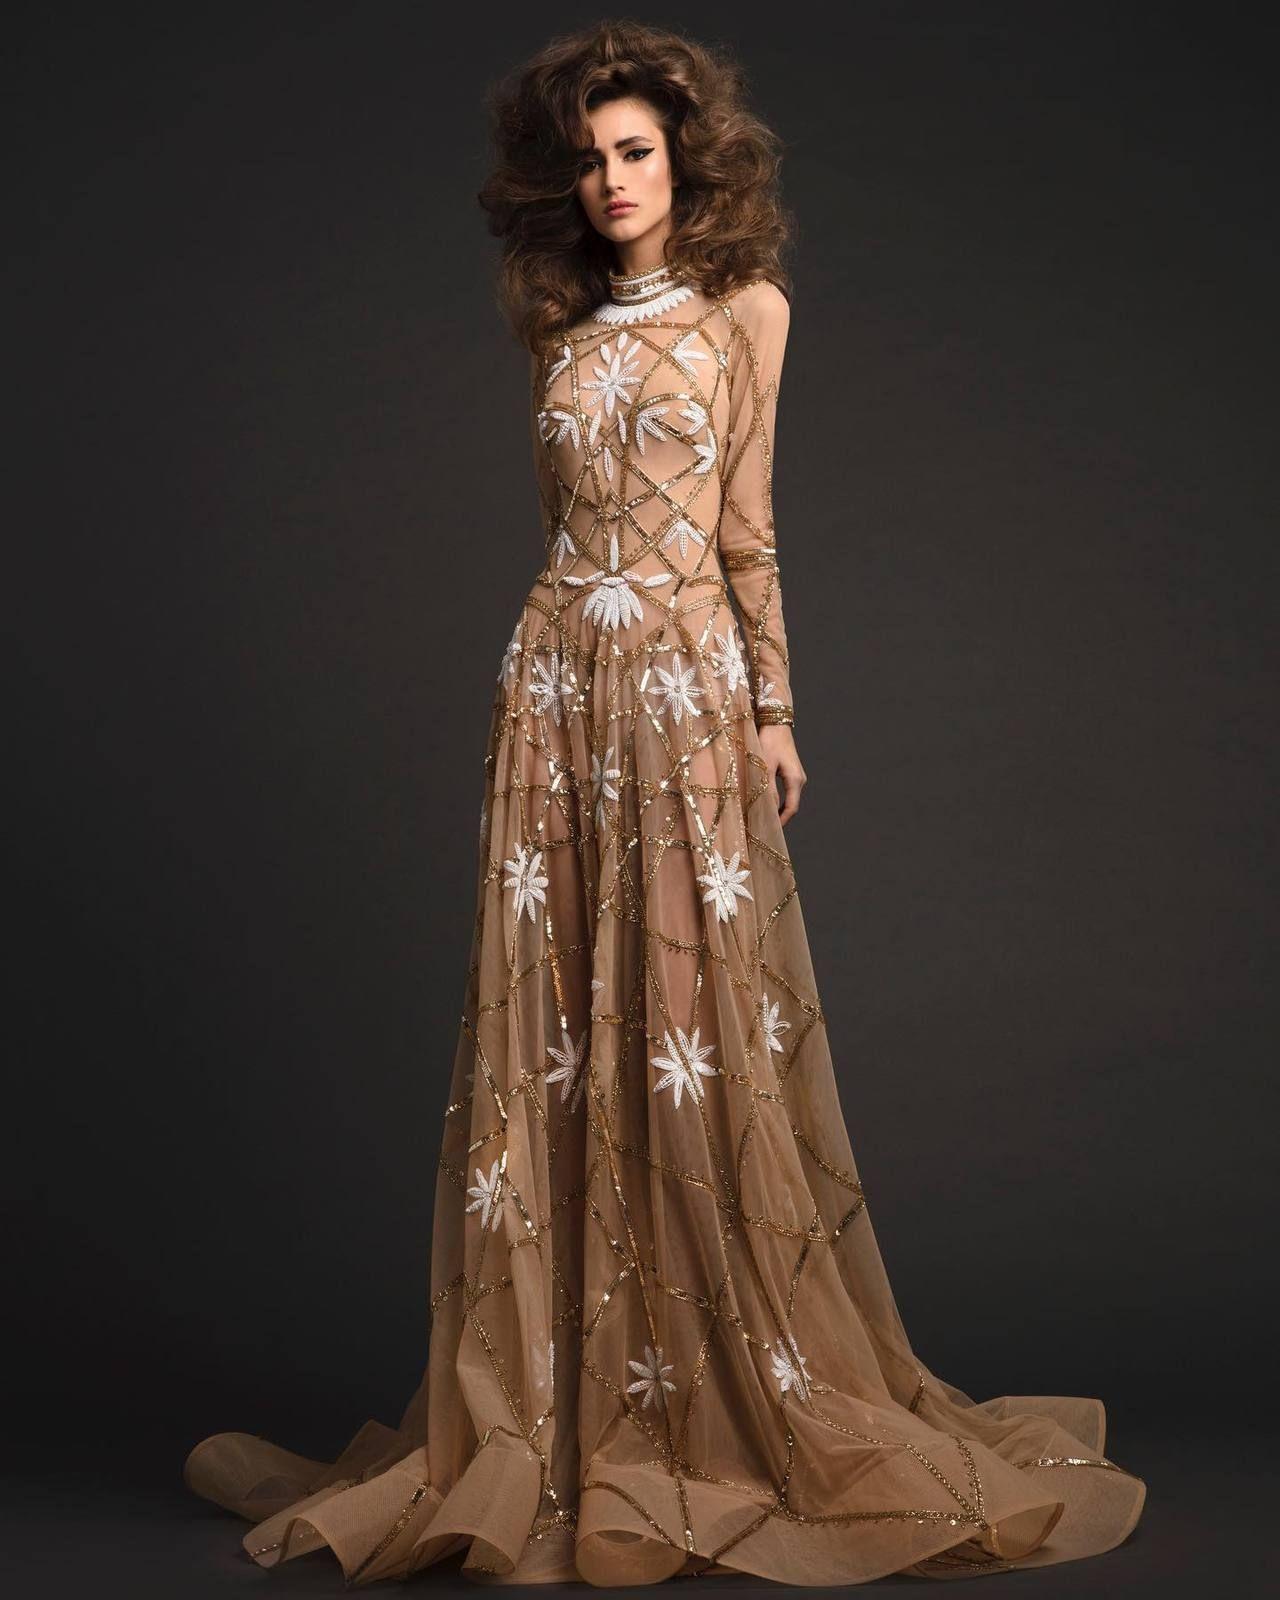 pindiana reyes on cosmic romance in 2020 | fashion